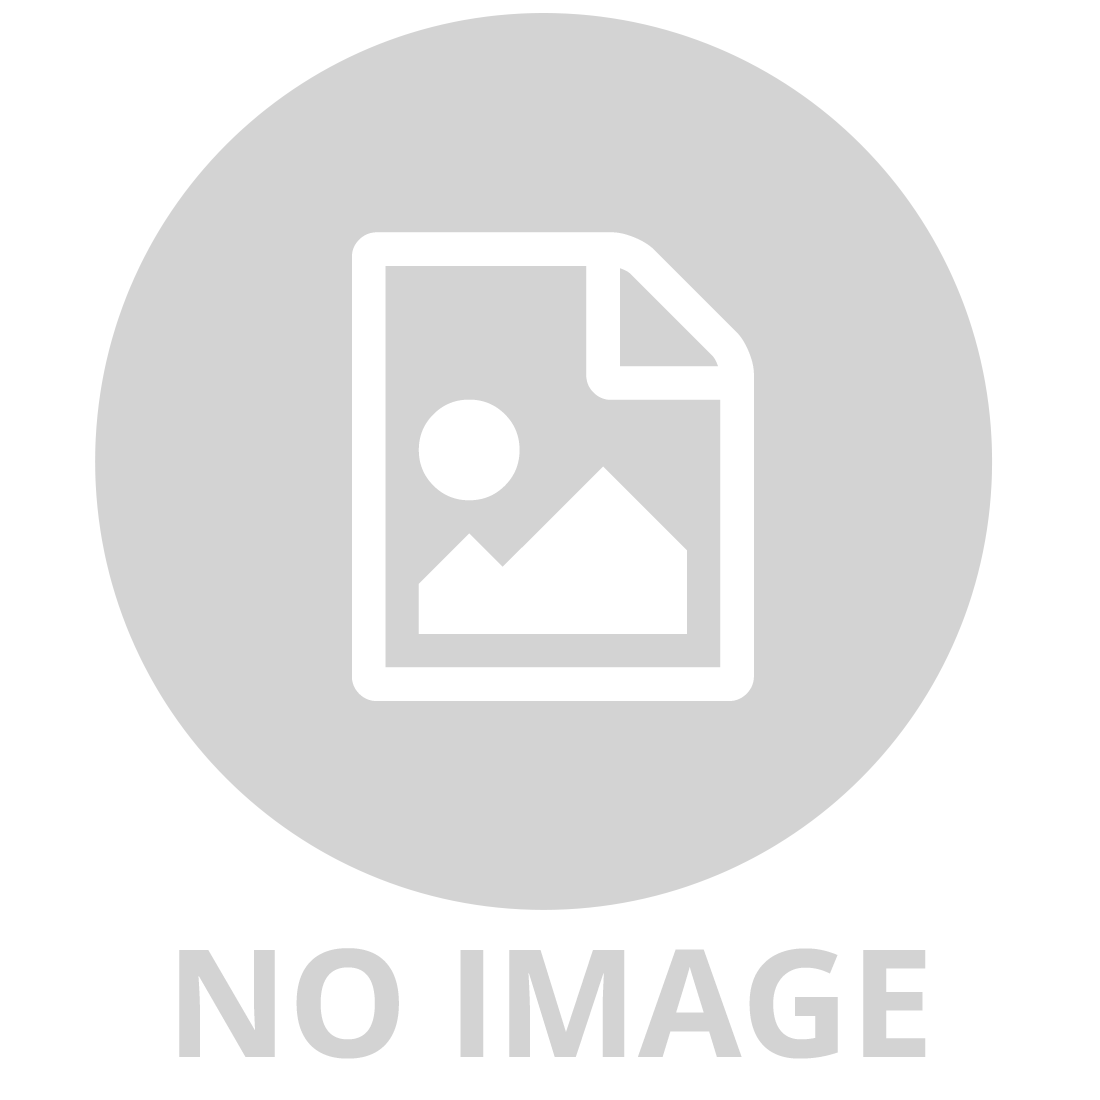 STORM HIGH SPEED 1/18 BLUE 4WD TRUCK RADIO CONTROL